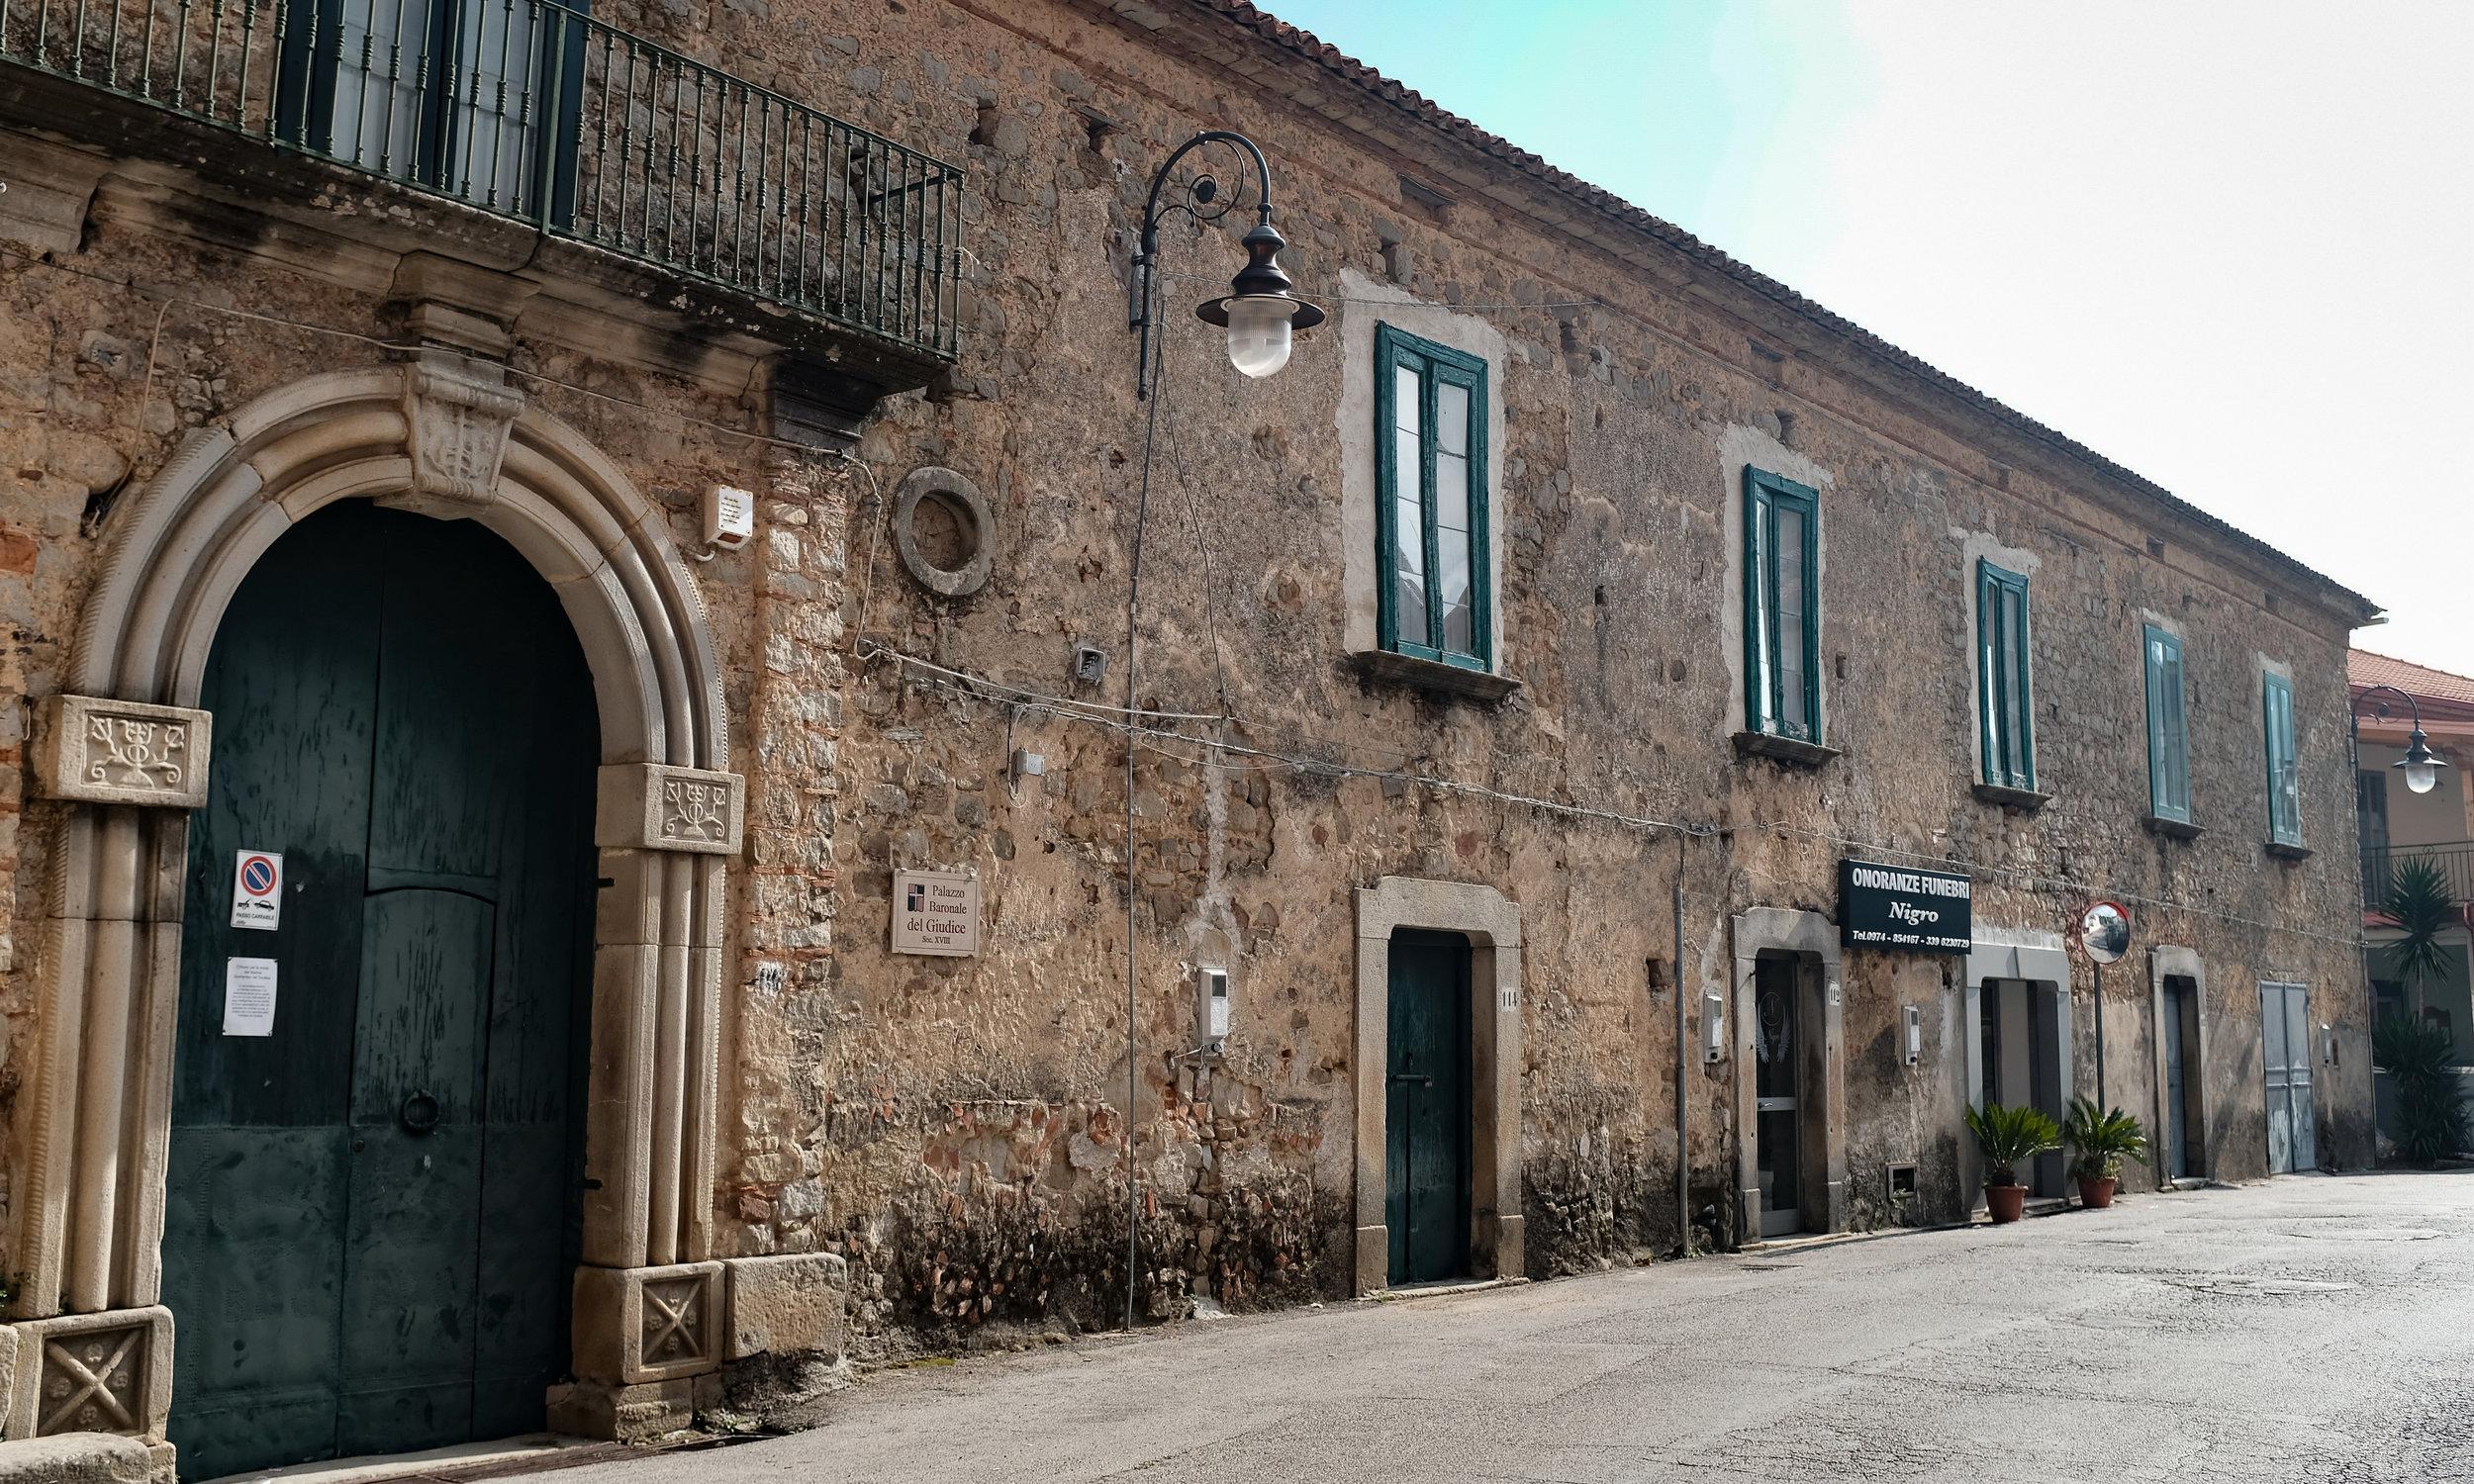 The Palazzo Baronale of San mango Cilento